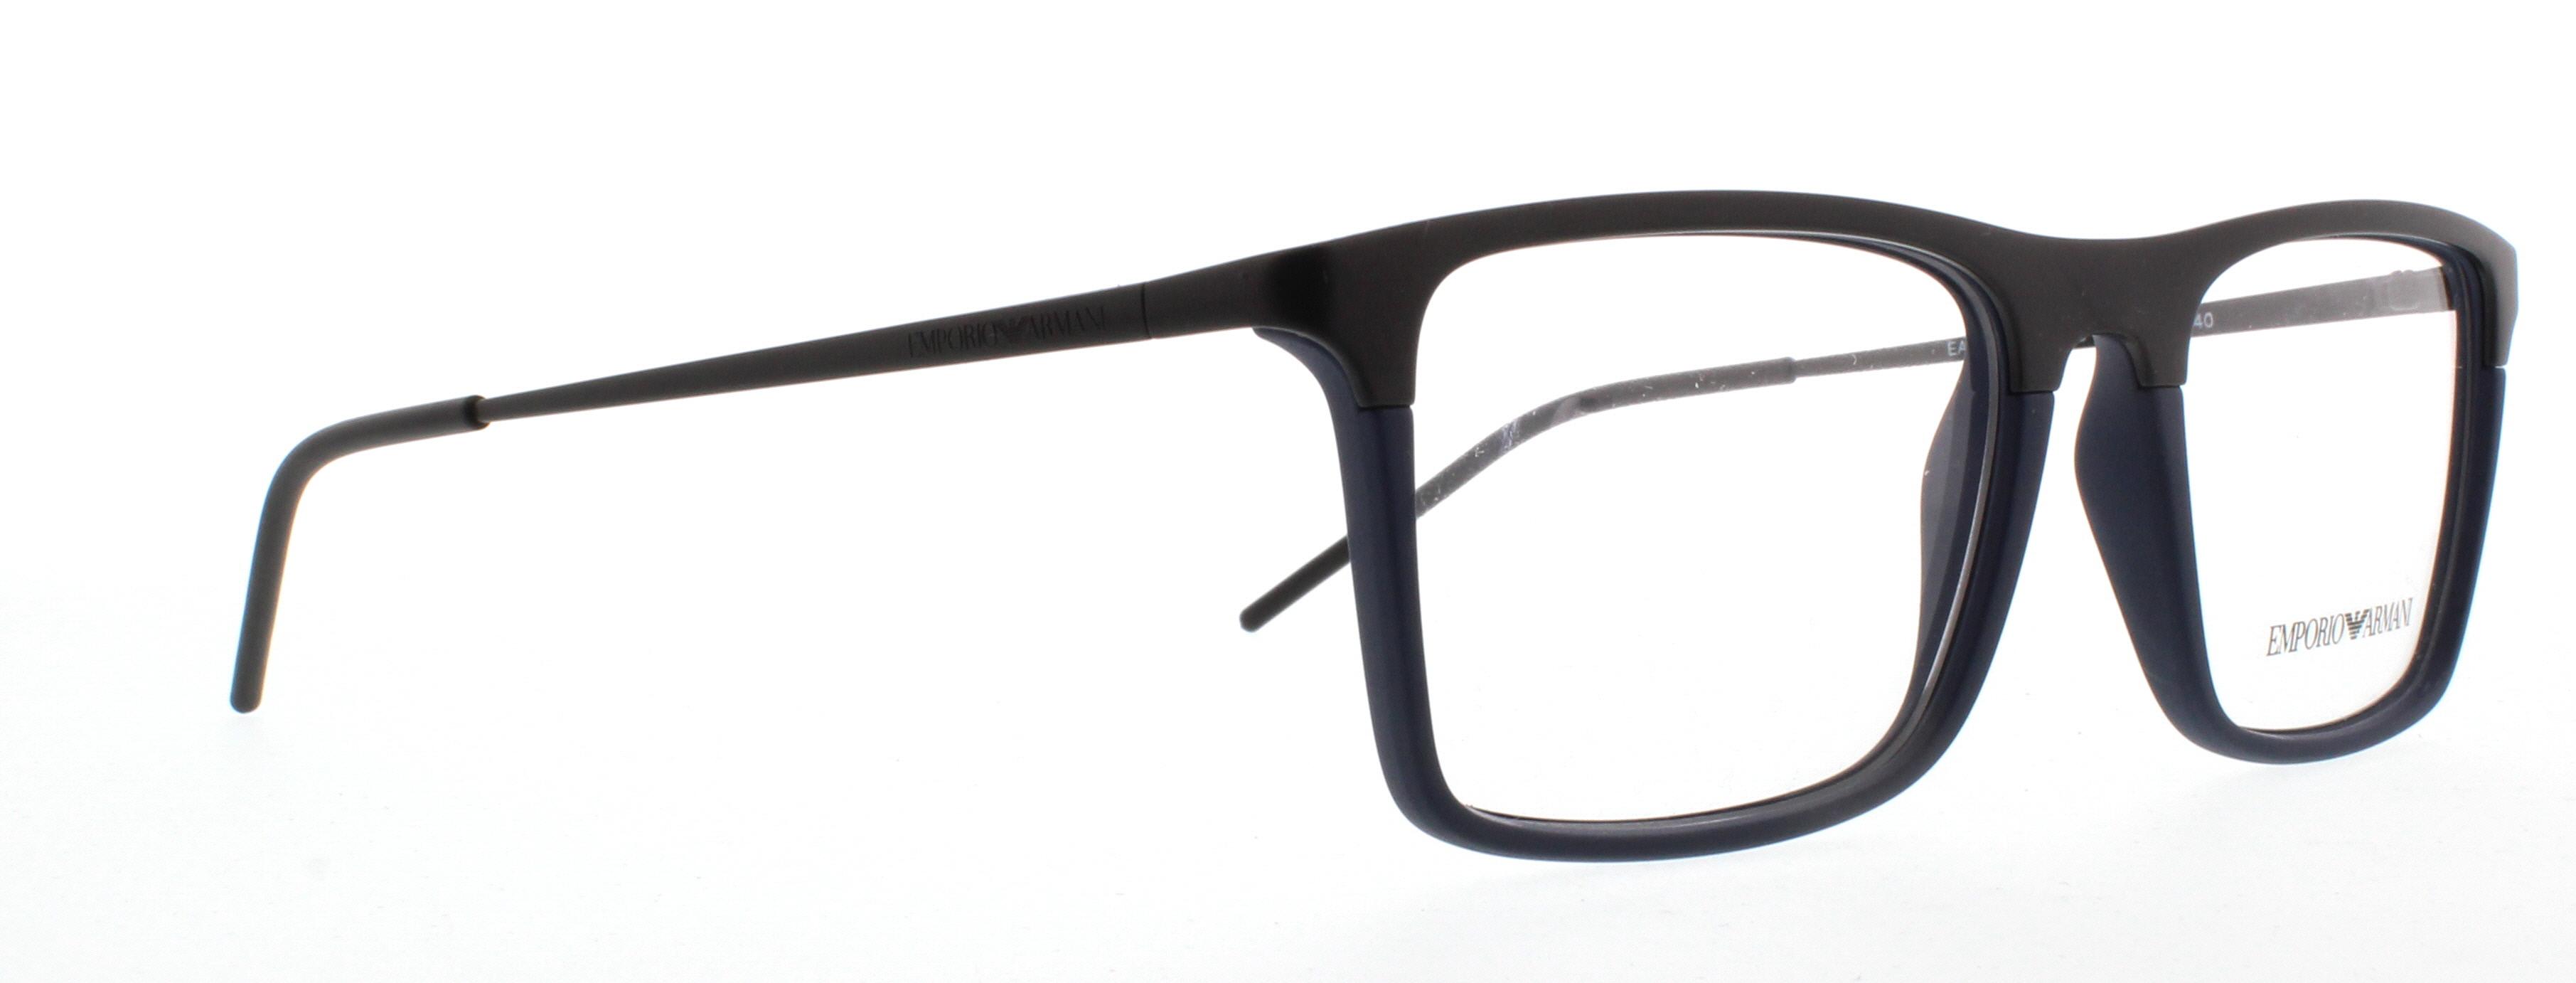 899b26c8719 Designer Frames Outlet. Emporio Armani EA1058